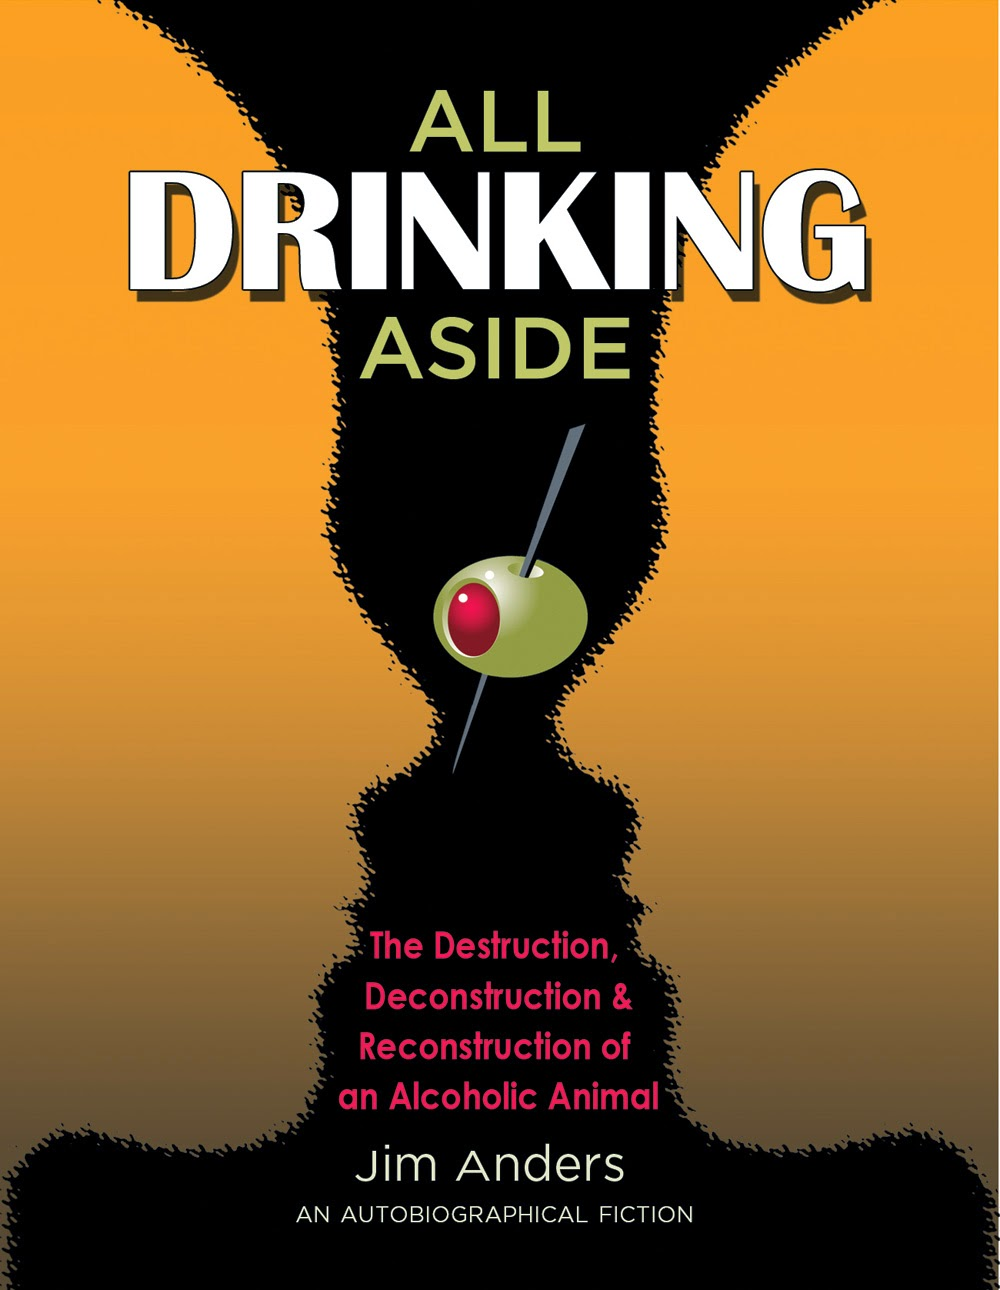 http://www.amazon.com/All-Drinking-Aside-Deconstruction-Reconstruction/dp/149239730X/ref=sr_1_1?ie=UTF8&qid=1383714712&sr=8-1&keywords=all+drinking+aside